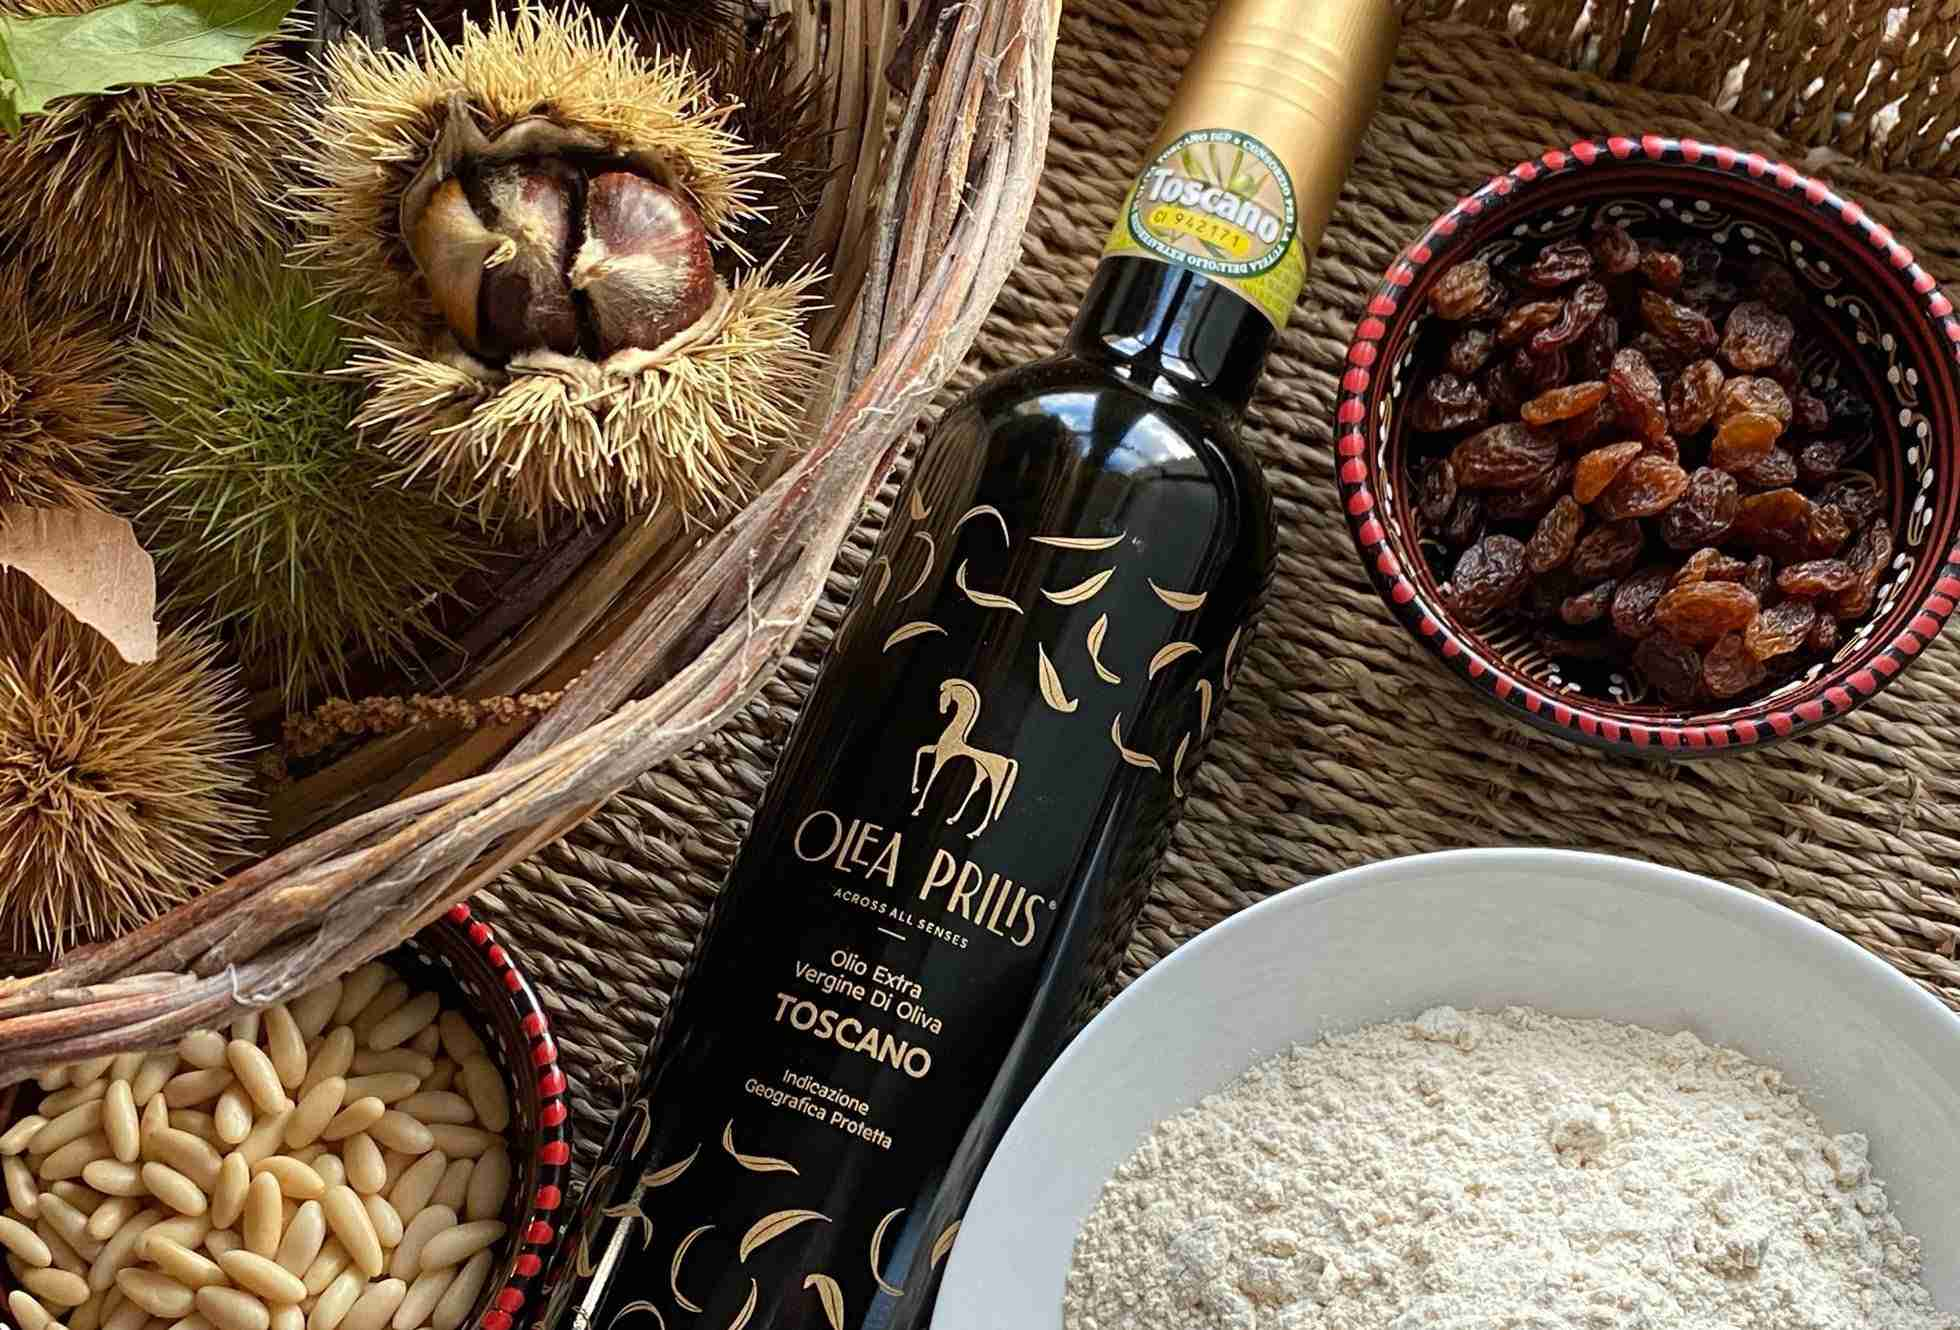 Castagnaccio - Tipico dolce toscano all'olio d'olivaOlea Prilis